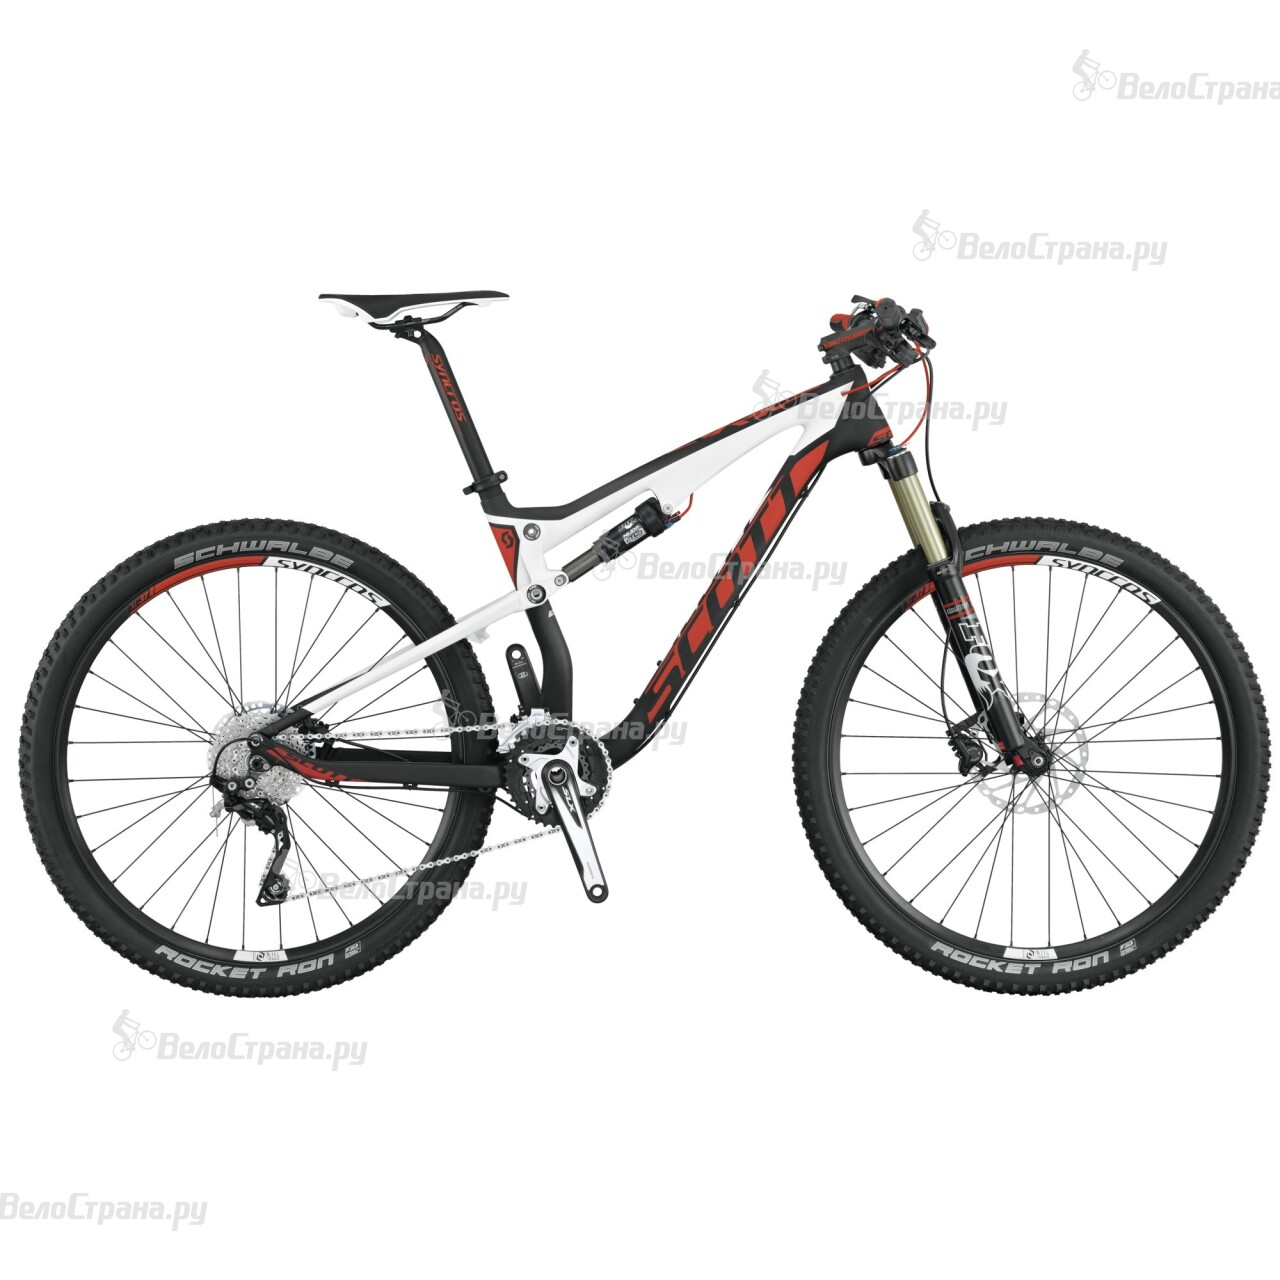 Велосипед Scott Spark 730 (2015) велосипед scott gambler 730 2015